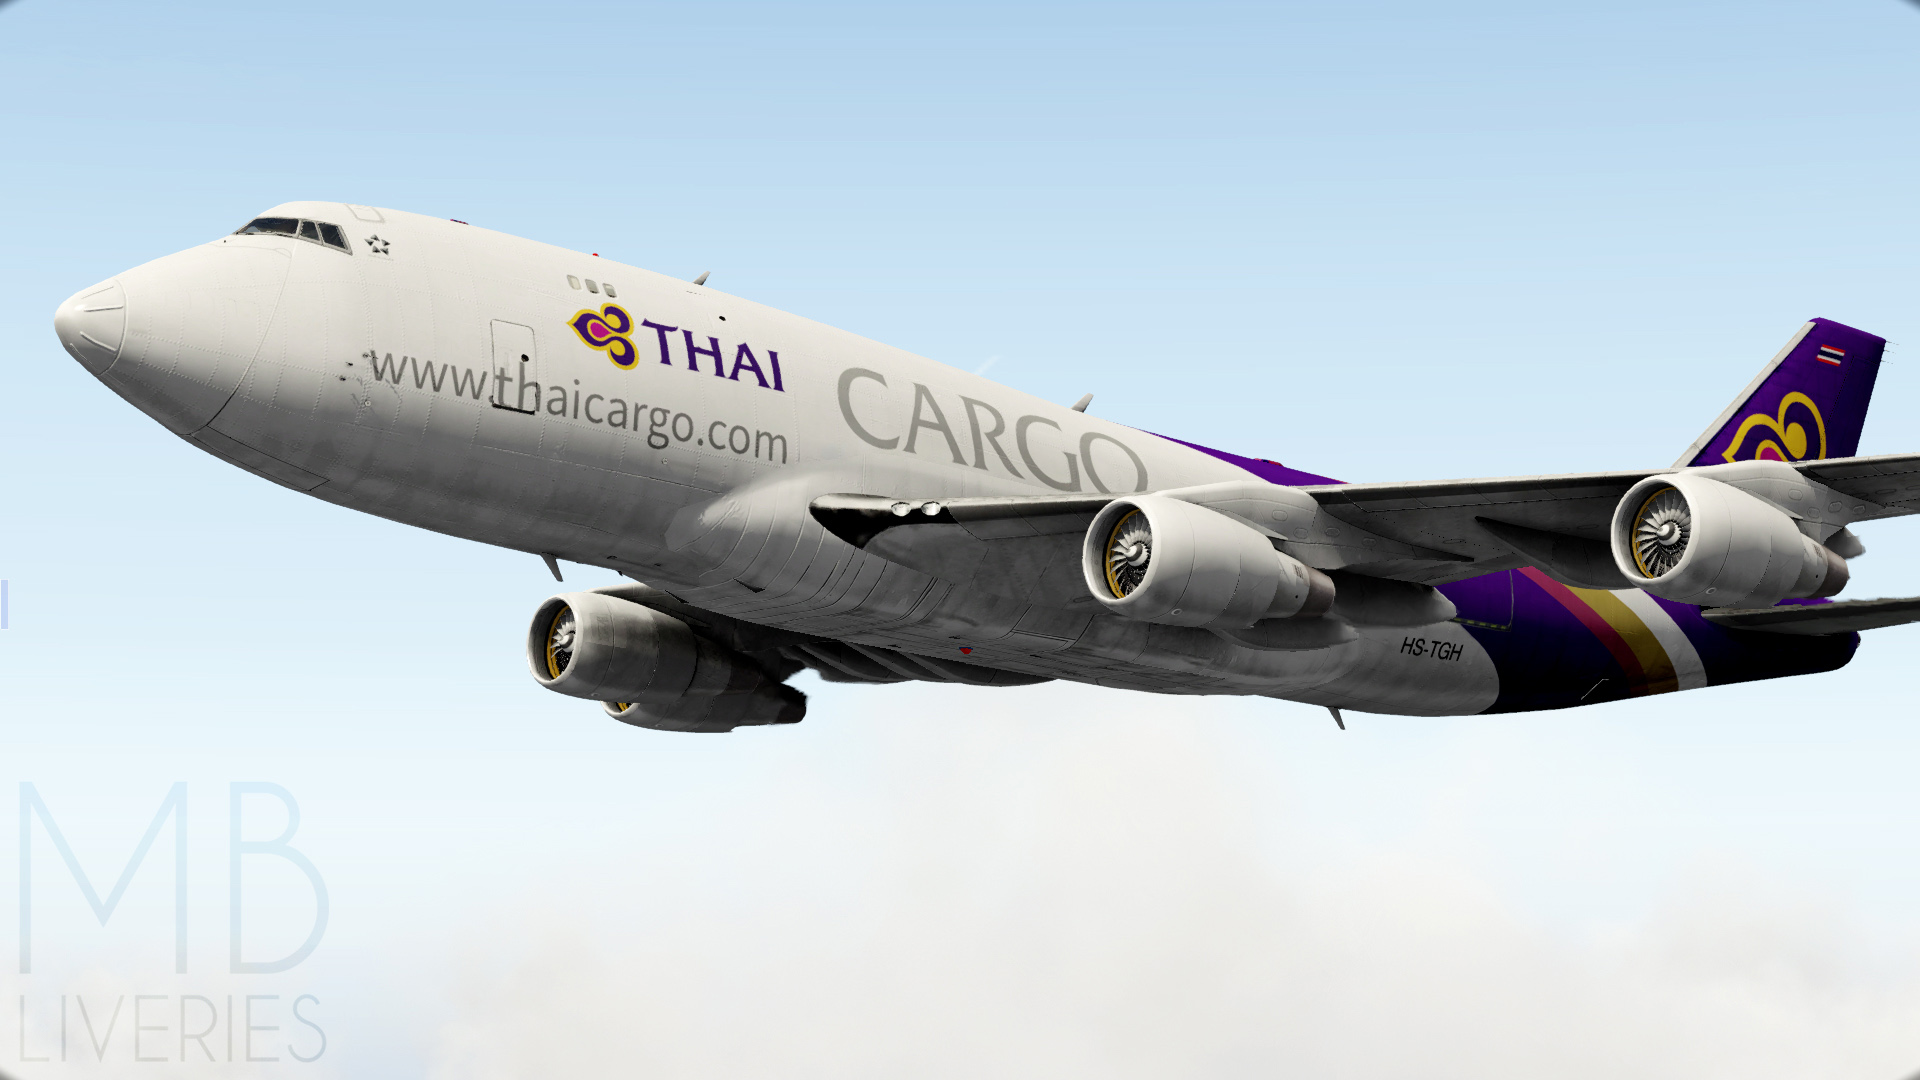 Thai Cargo - Boeing 747-400F (default) - Aircraft Skins